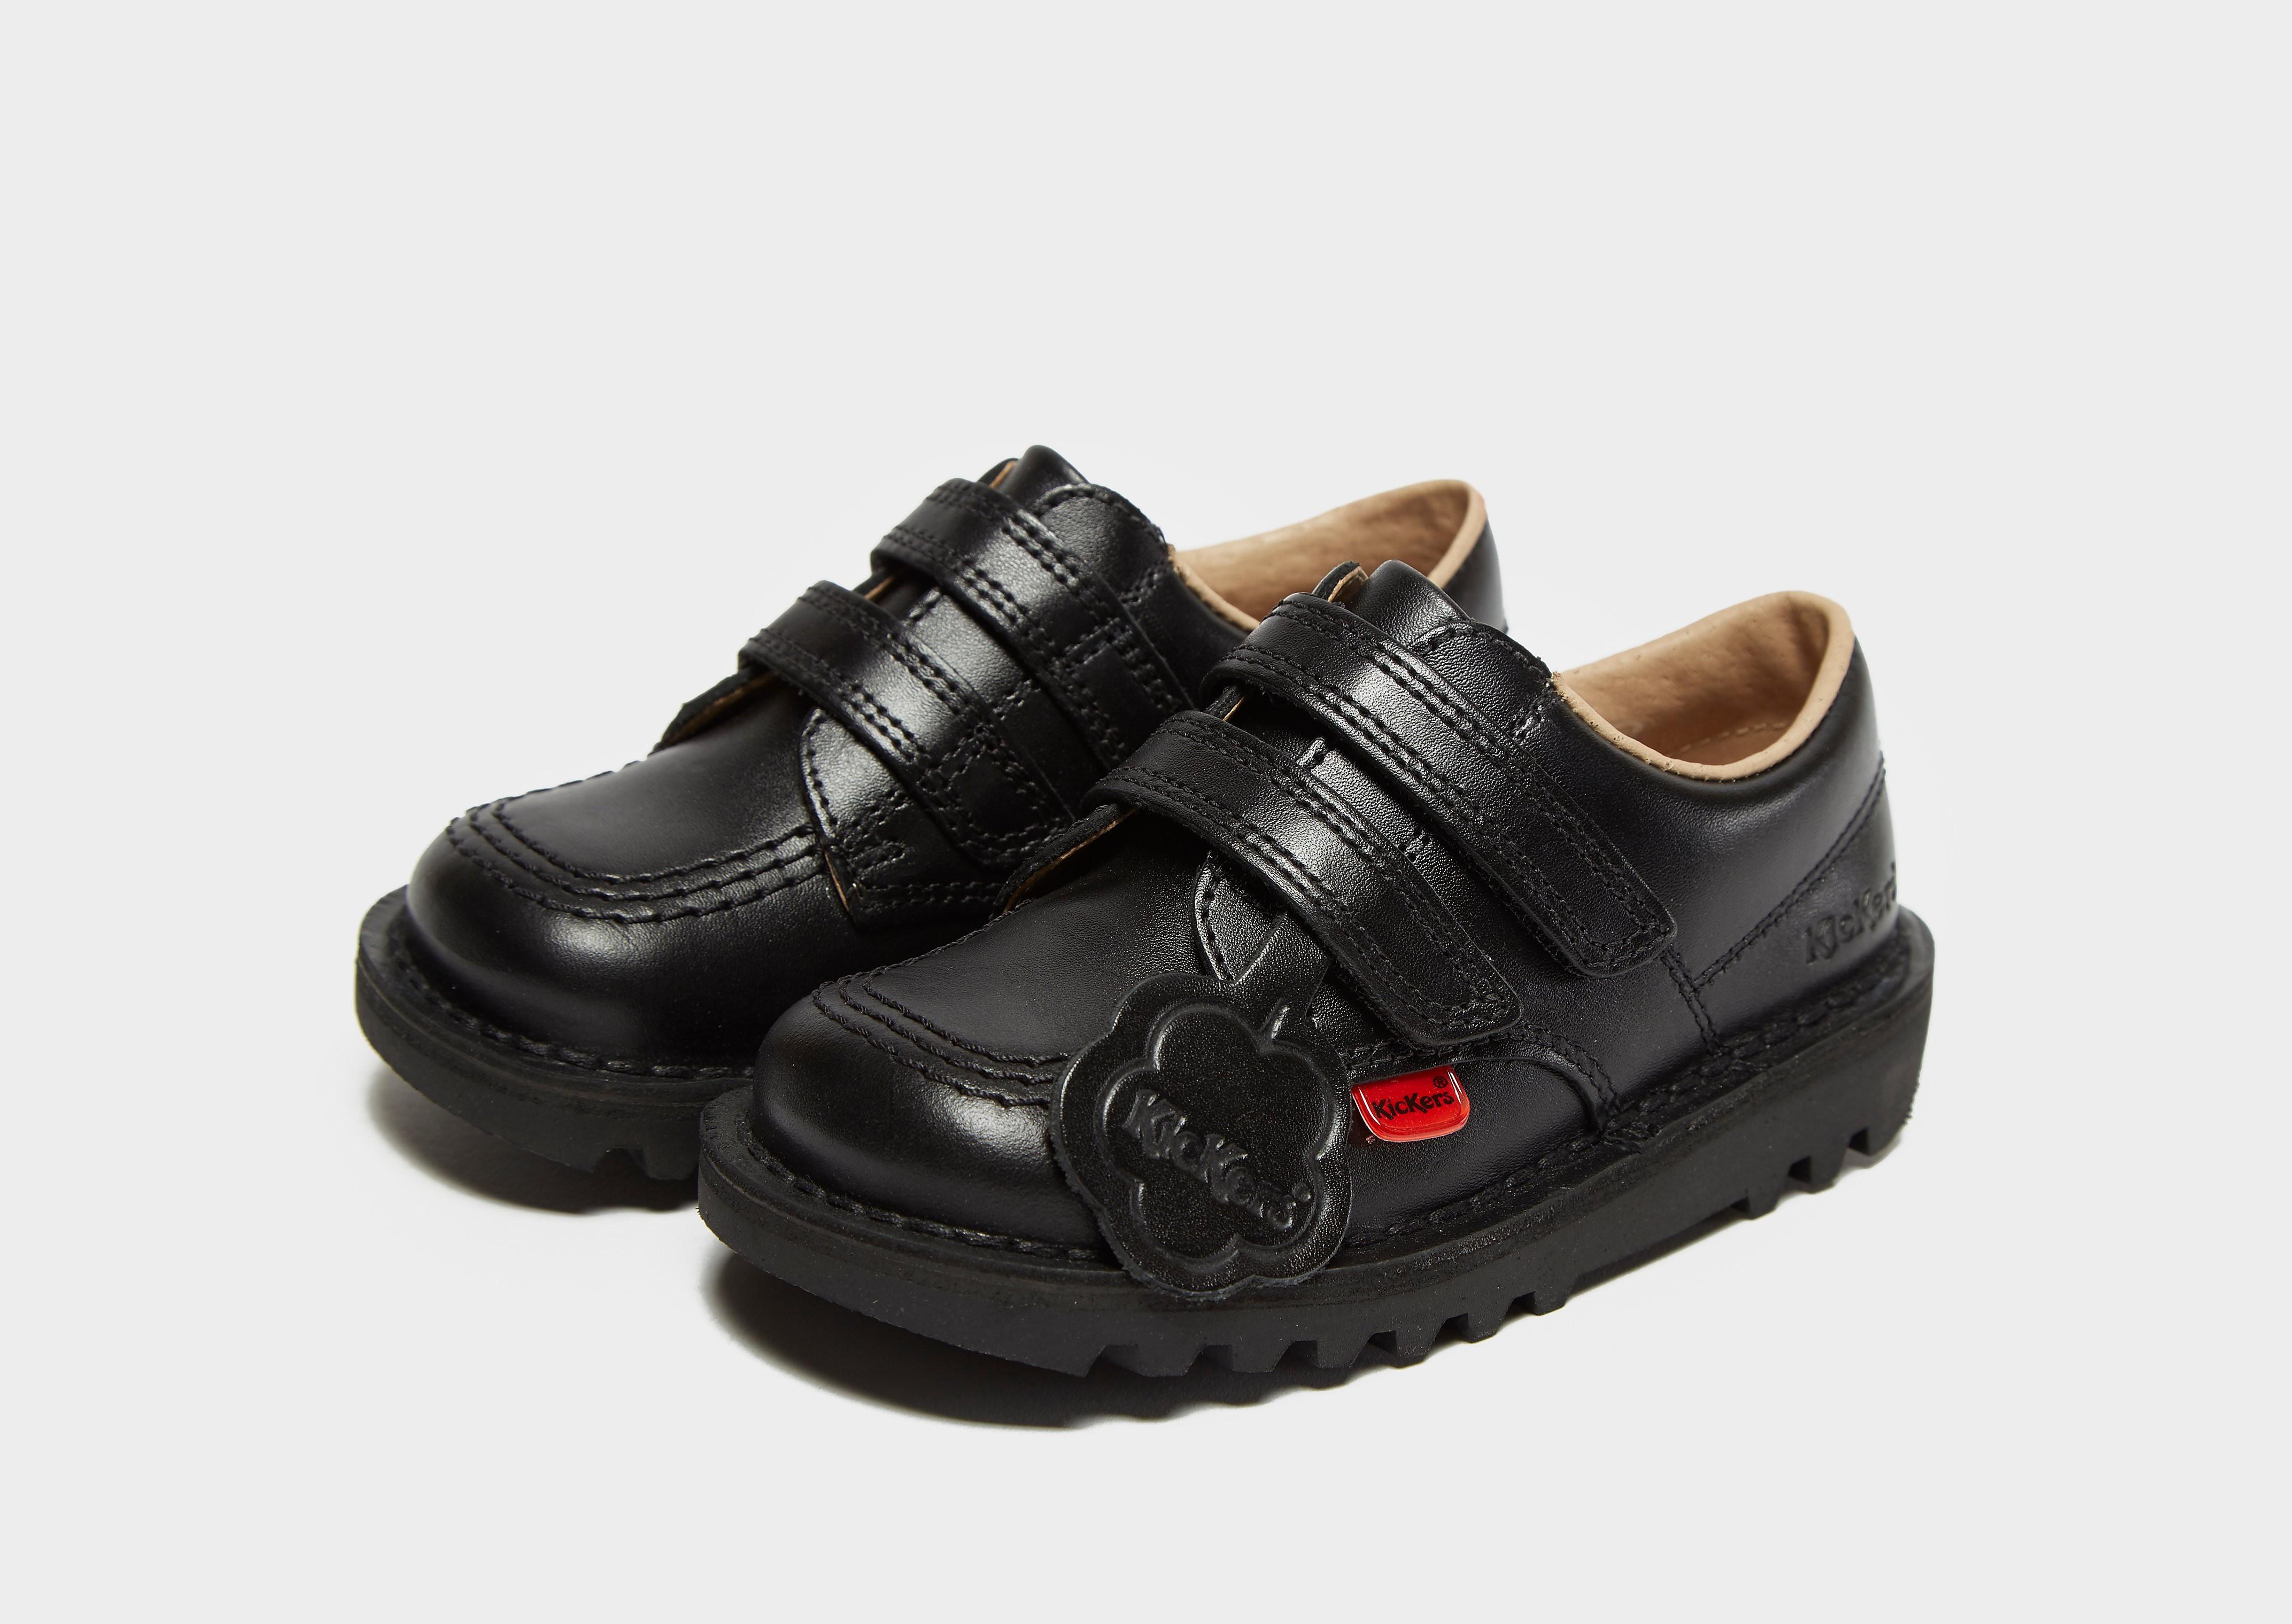 Kickers Kick Lo Vel School Shoes Infant